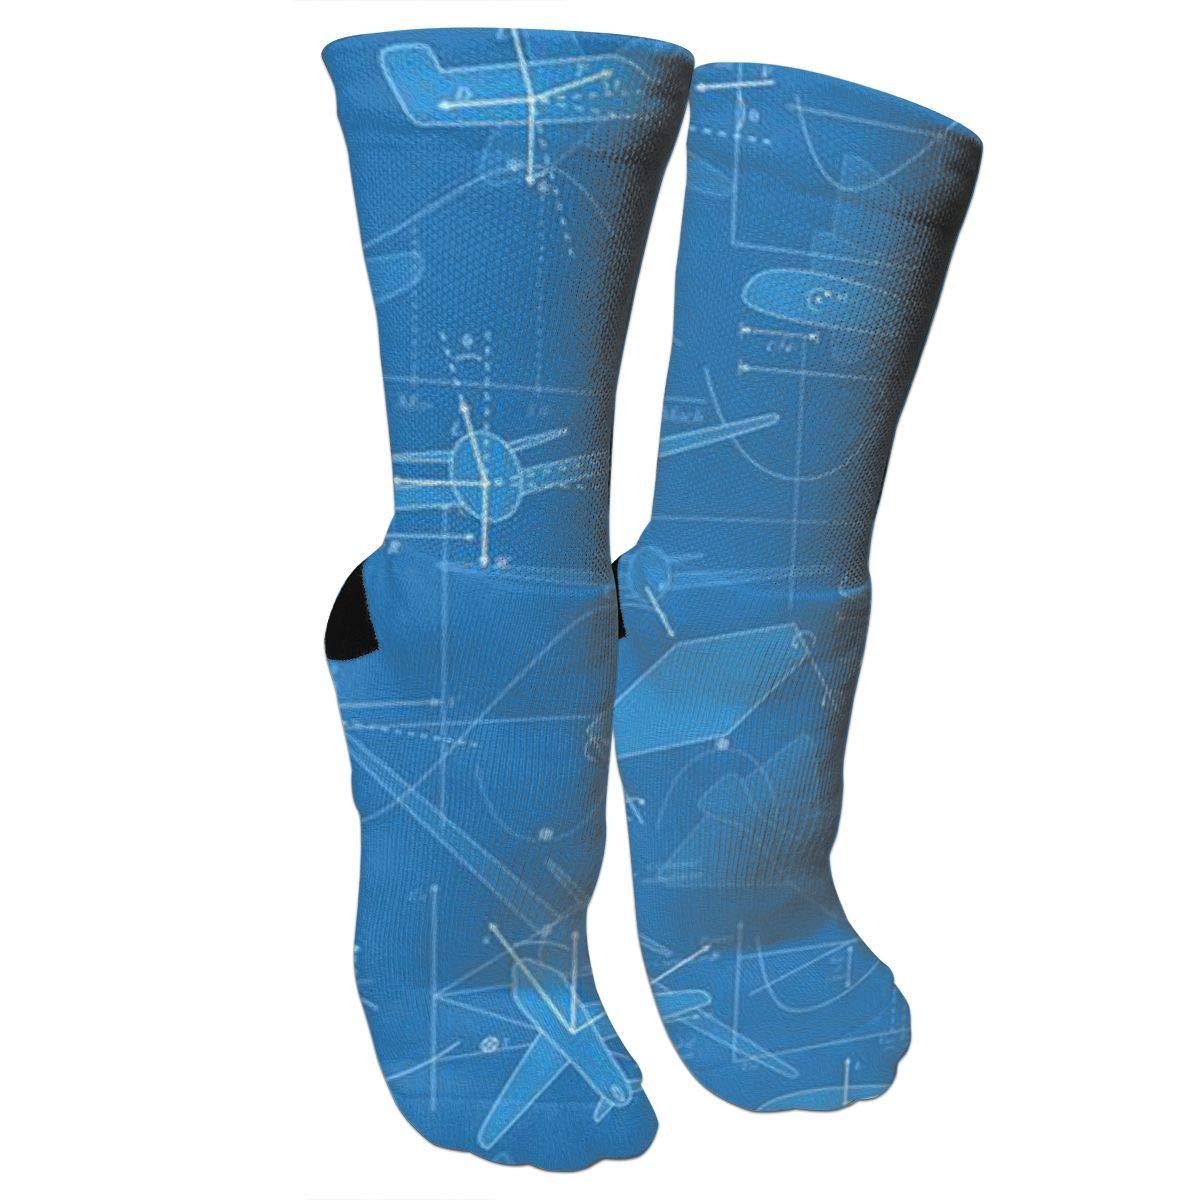 1200x1200 Lalabulu Crazy Socks Flight Drawings Crew Socks